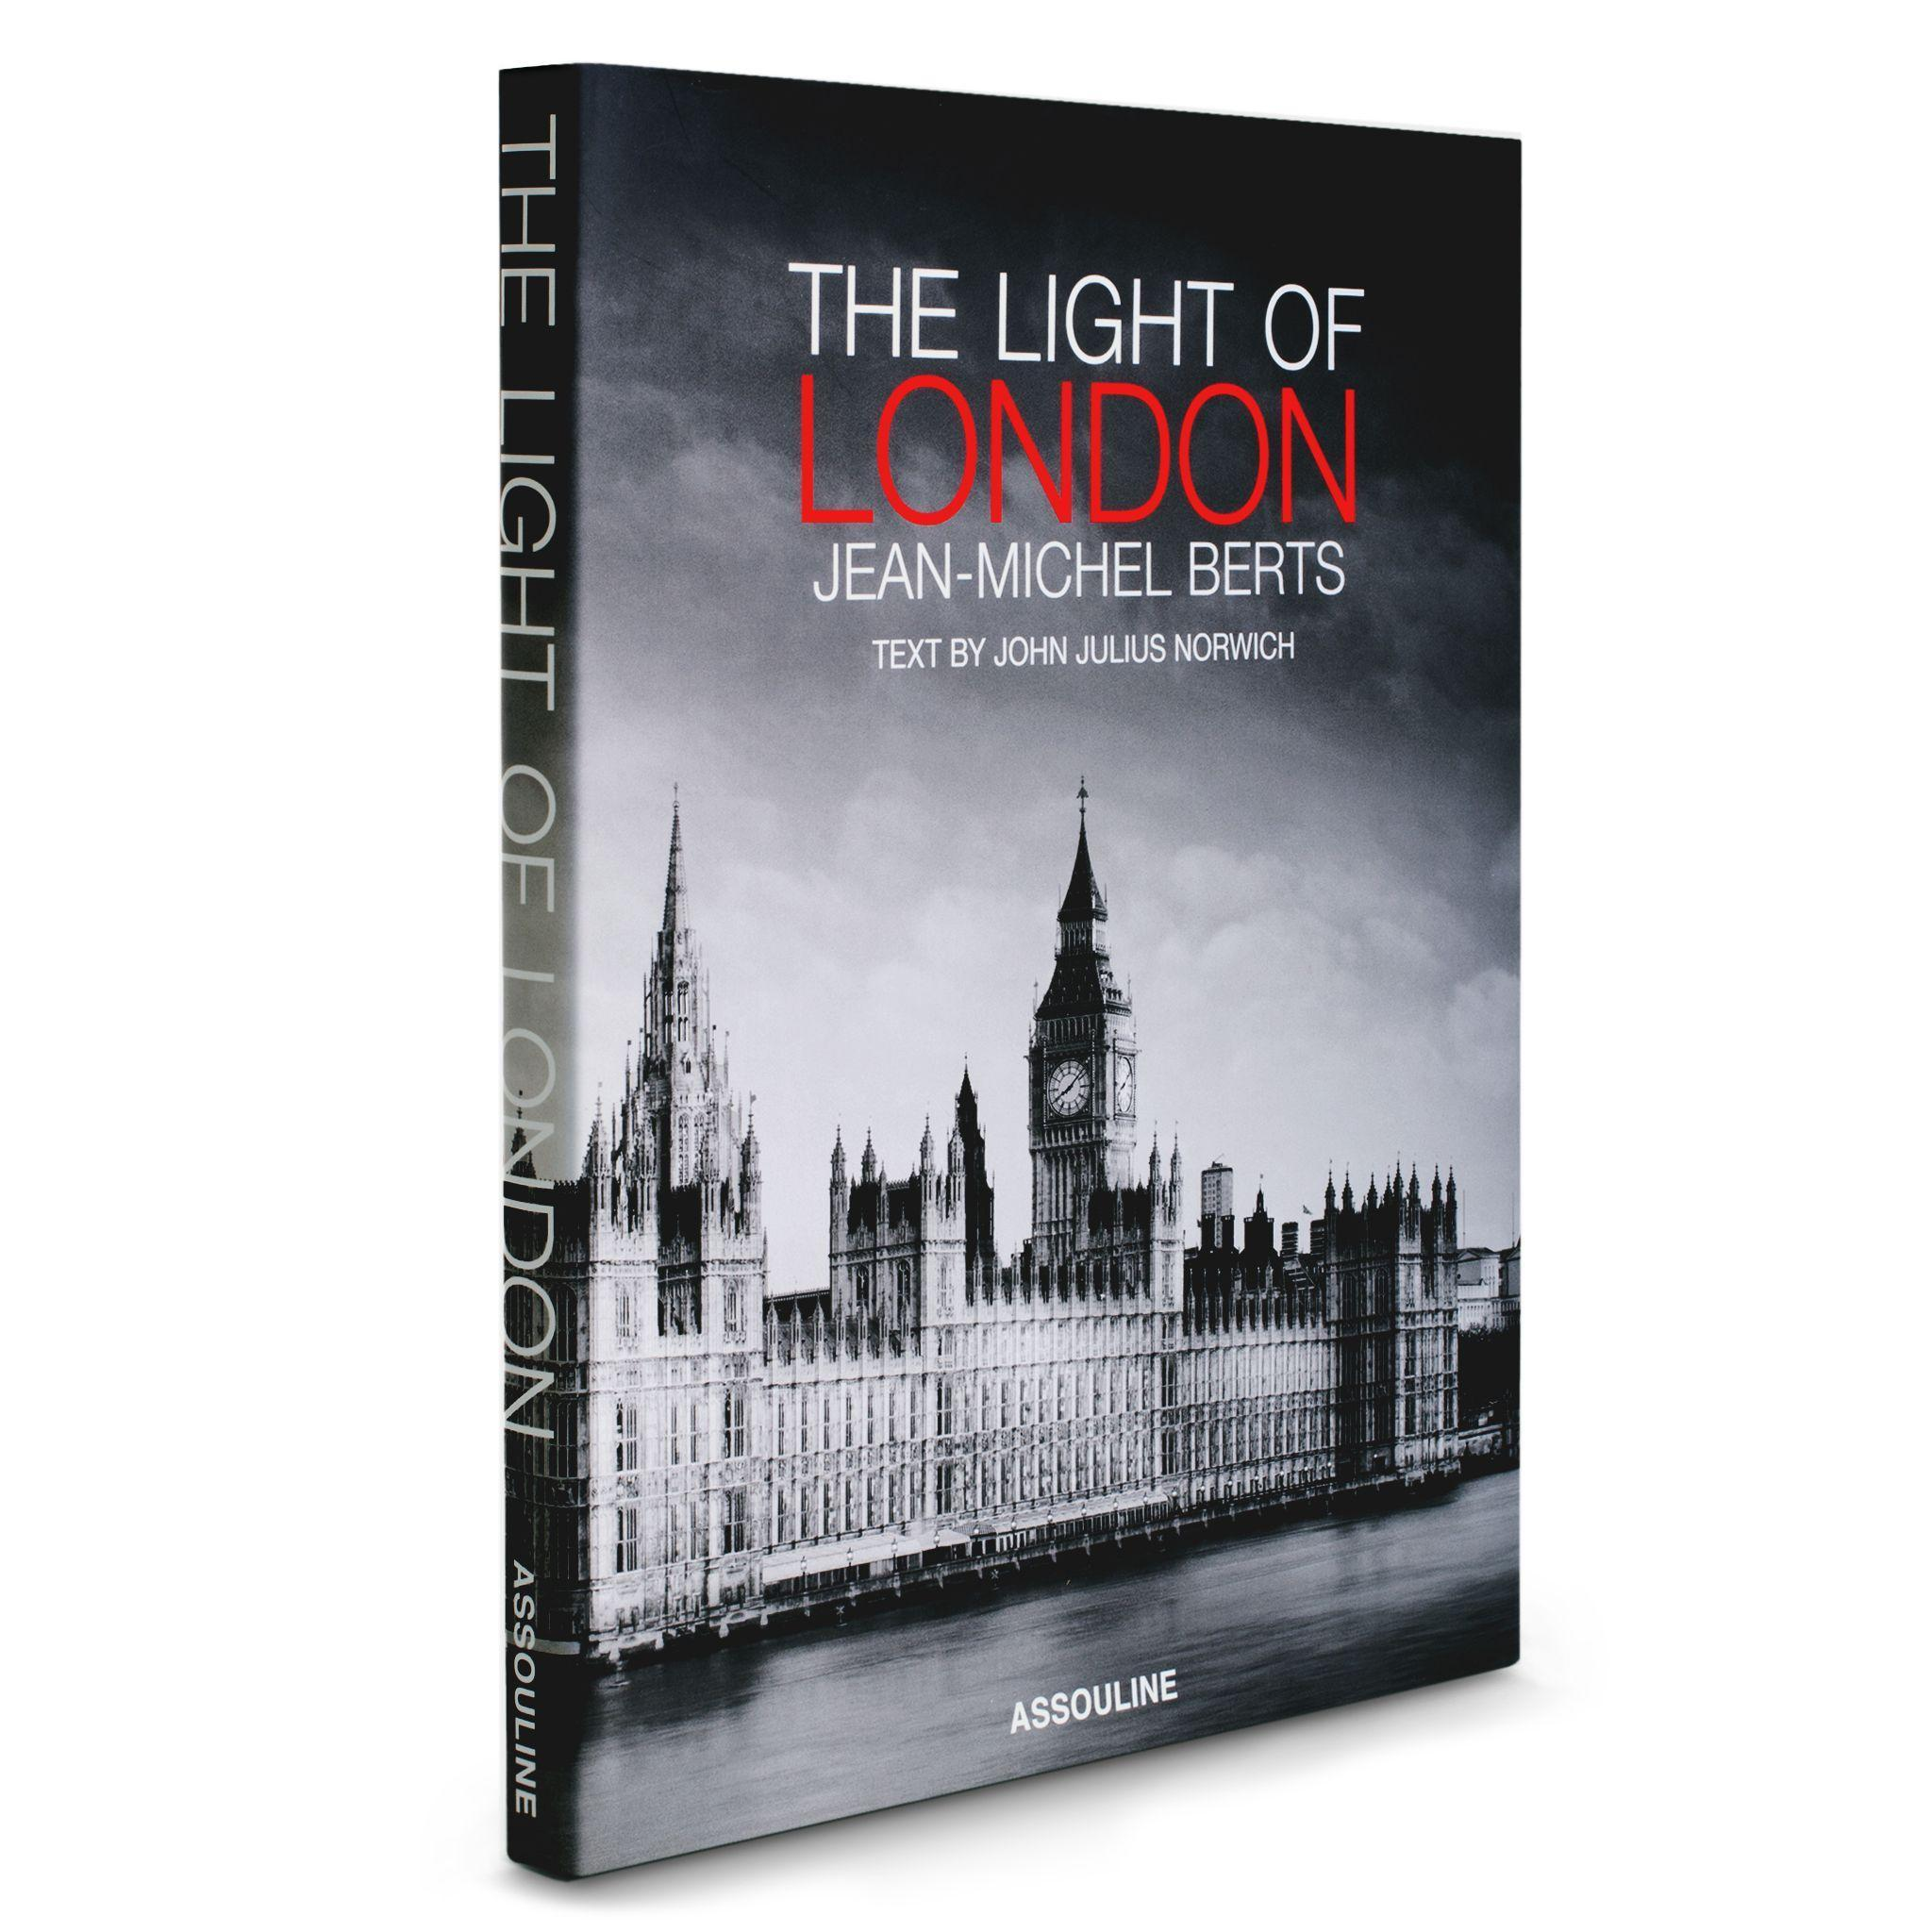 Light of London, Jean-Michel Berts